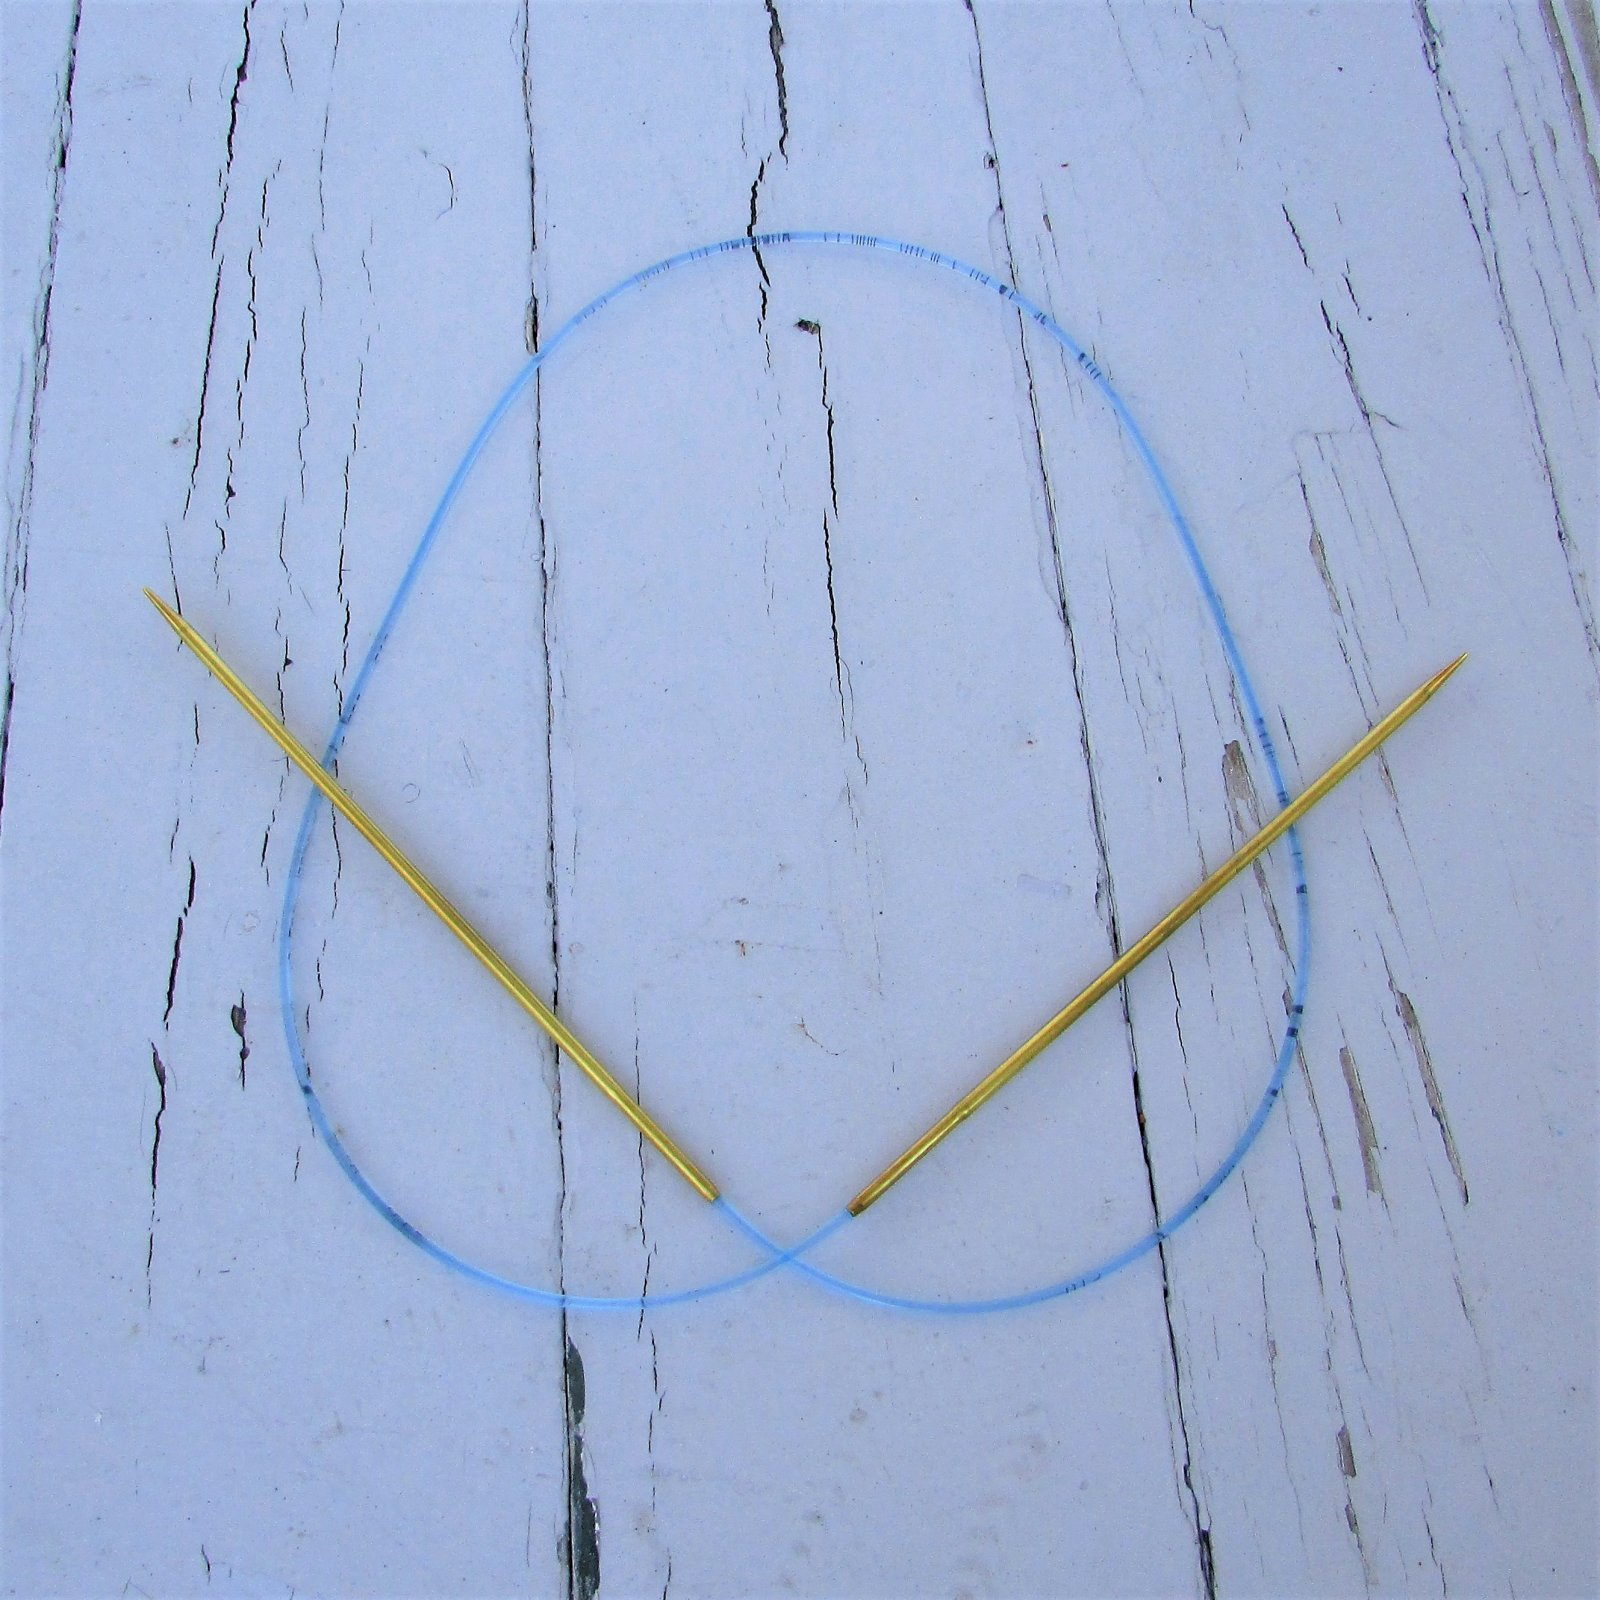 Addi Lace 32 Circular Needles